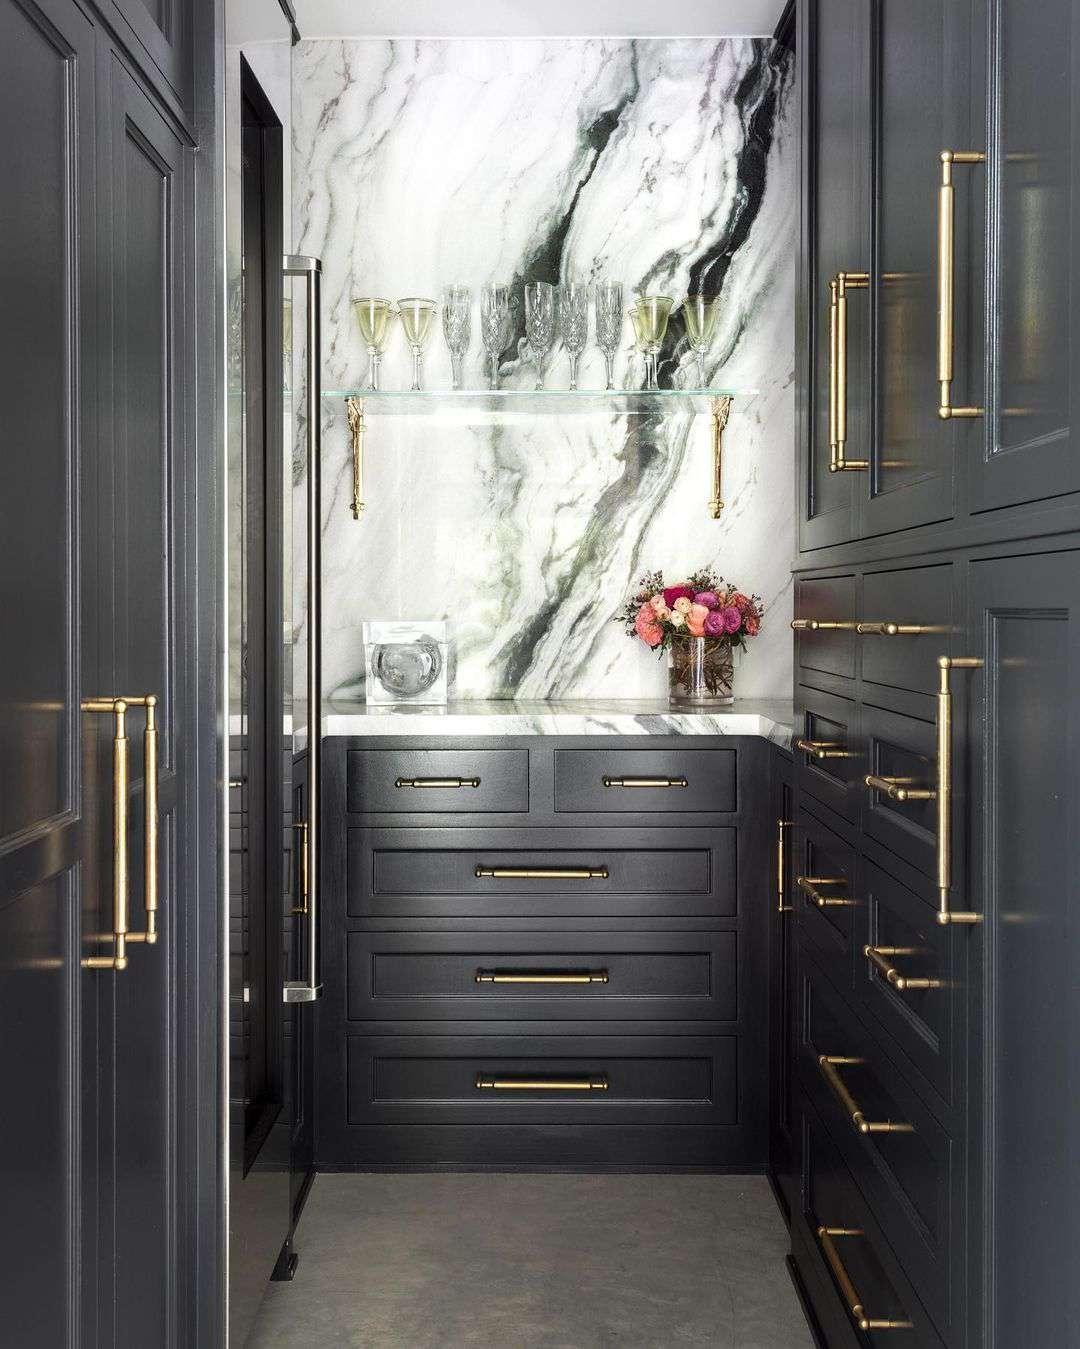 Butler's pantry with marble backsplash